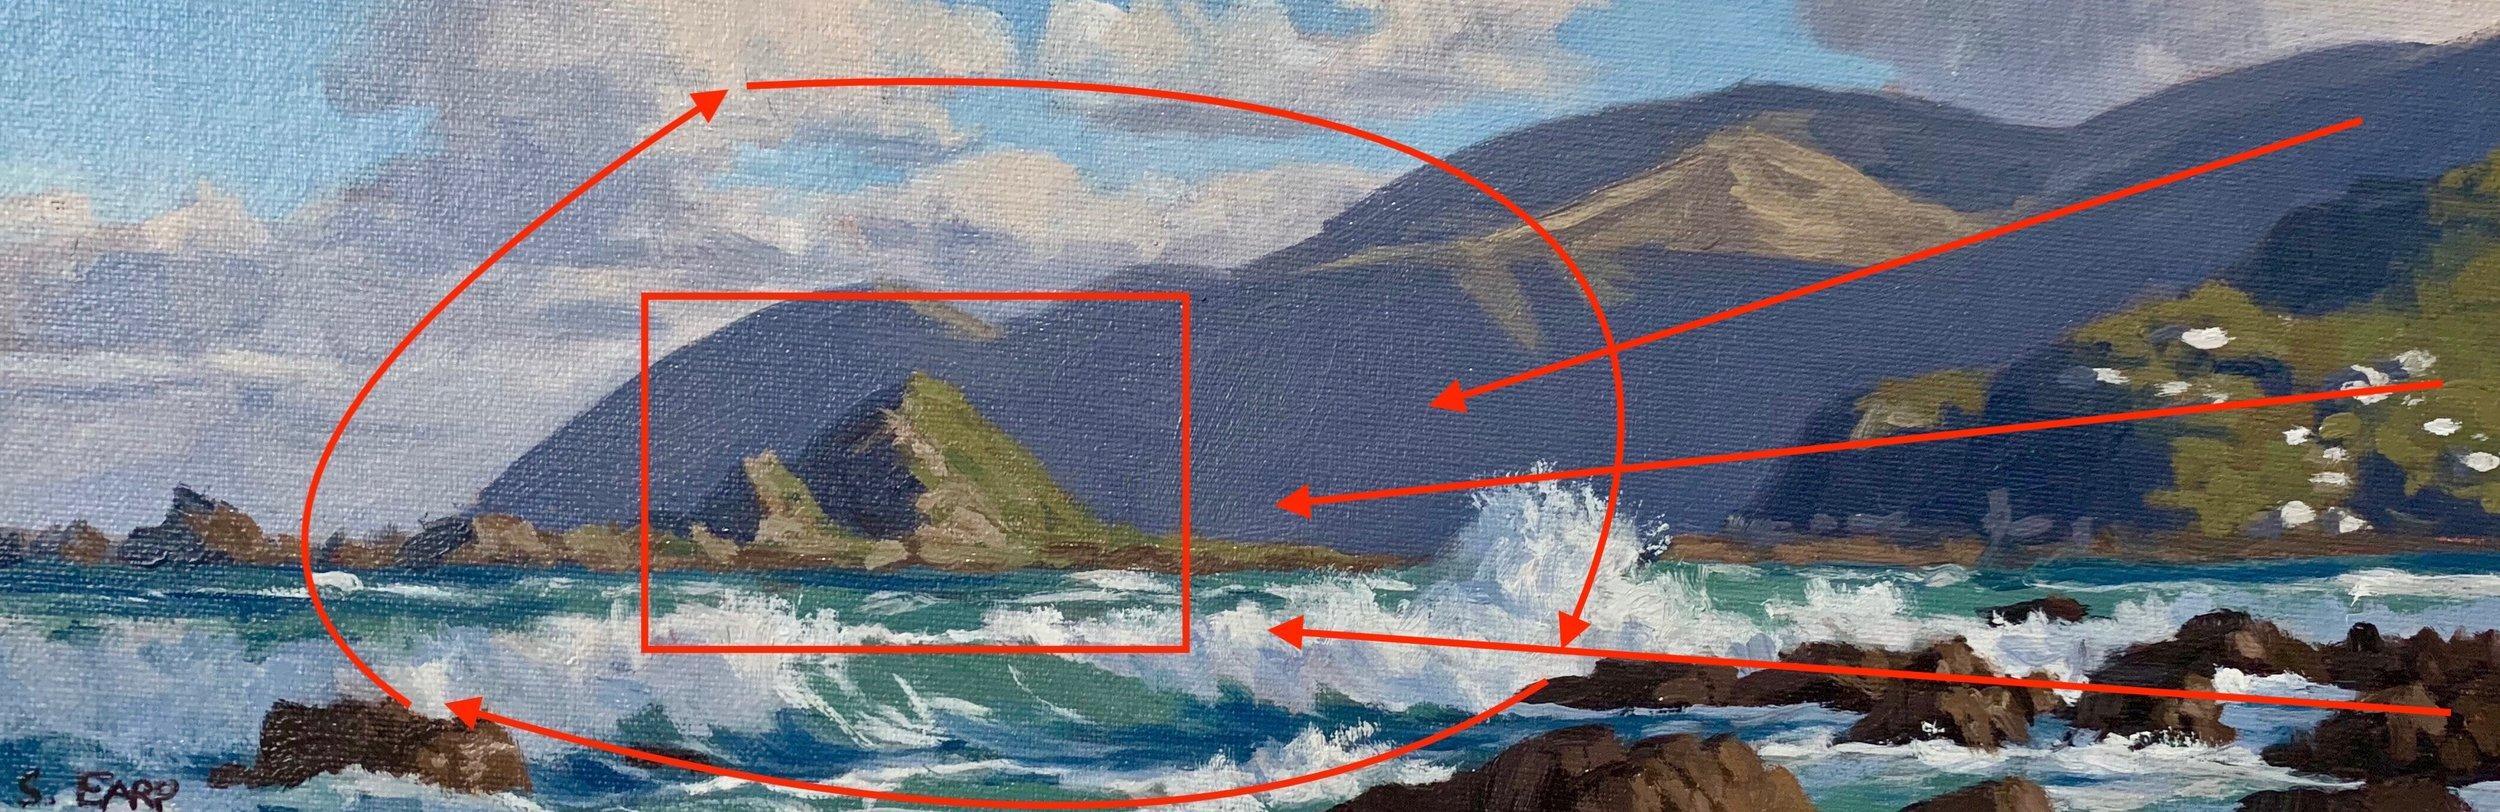 Wellington Coast - small oil painting - Samuel Earp - seascape artist - composition 5.jpg